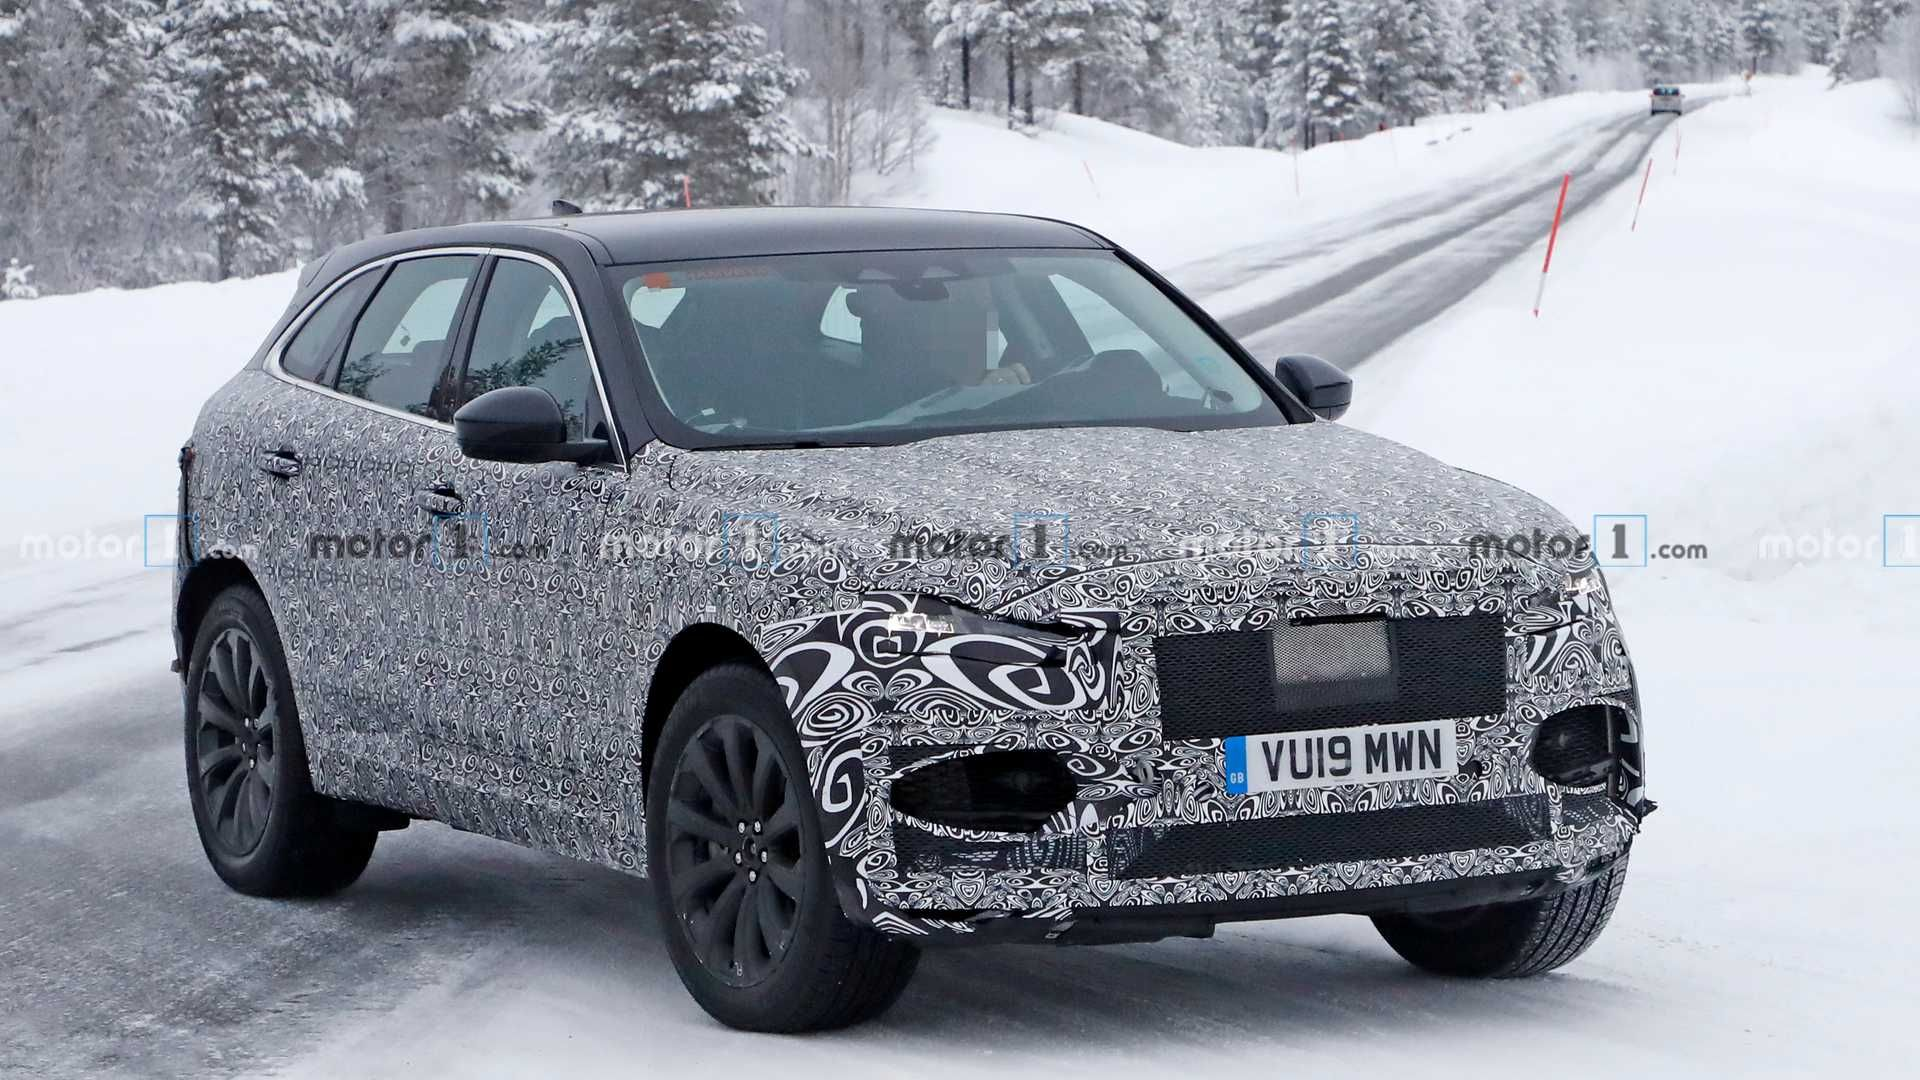 шпионские снимки нового Jaguar F-pace